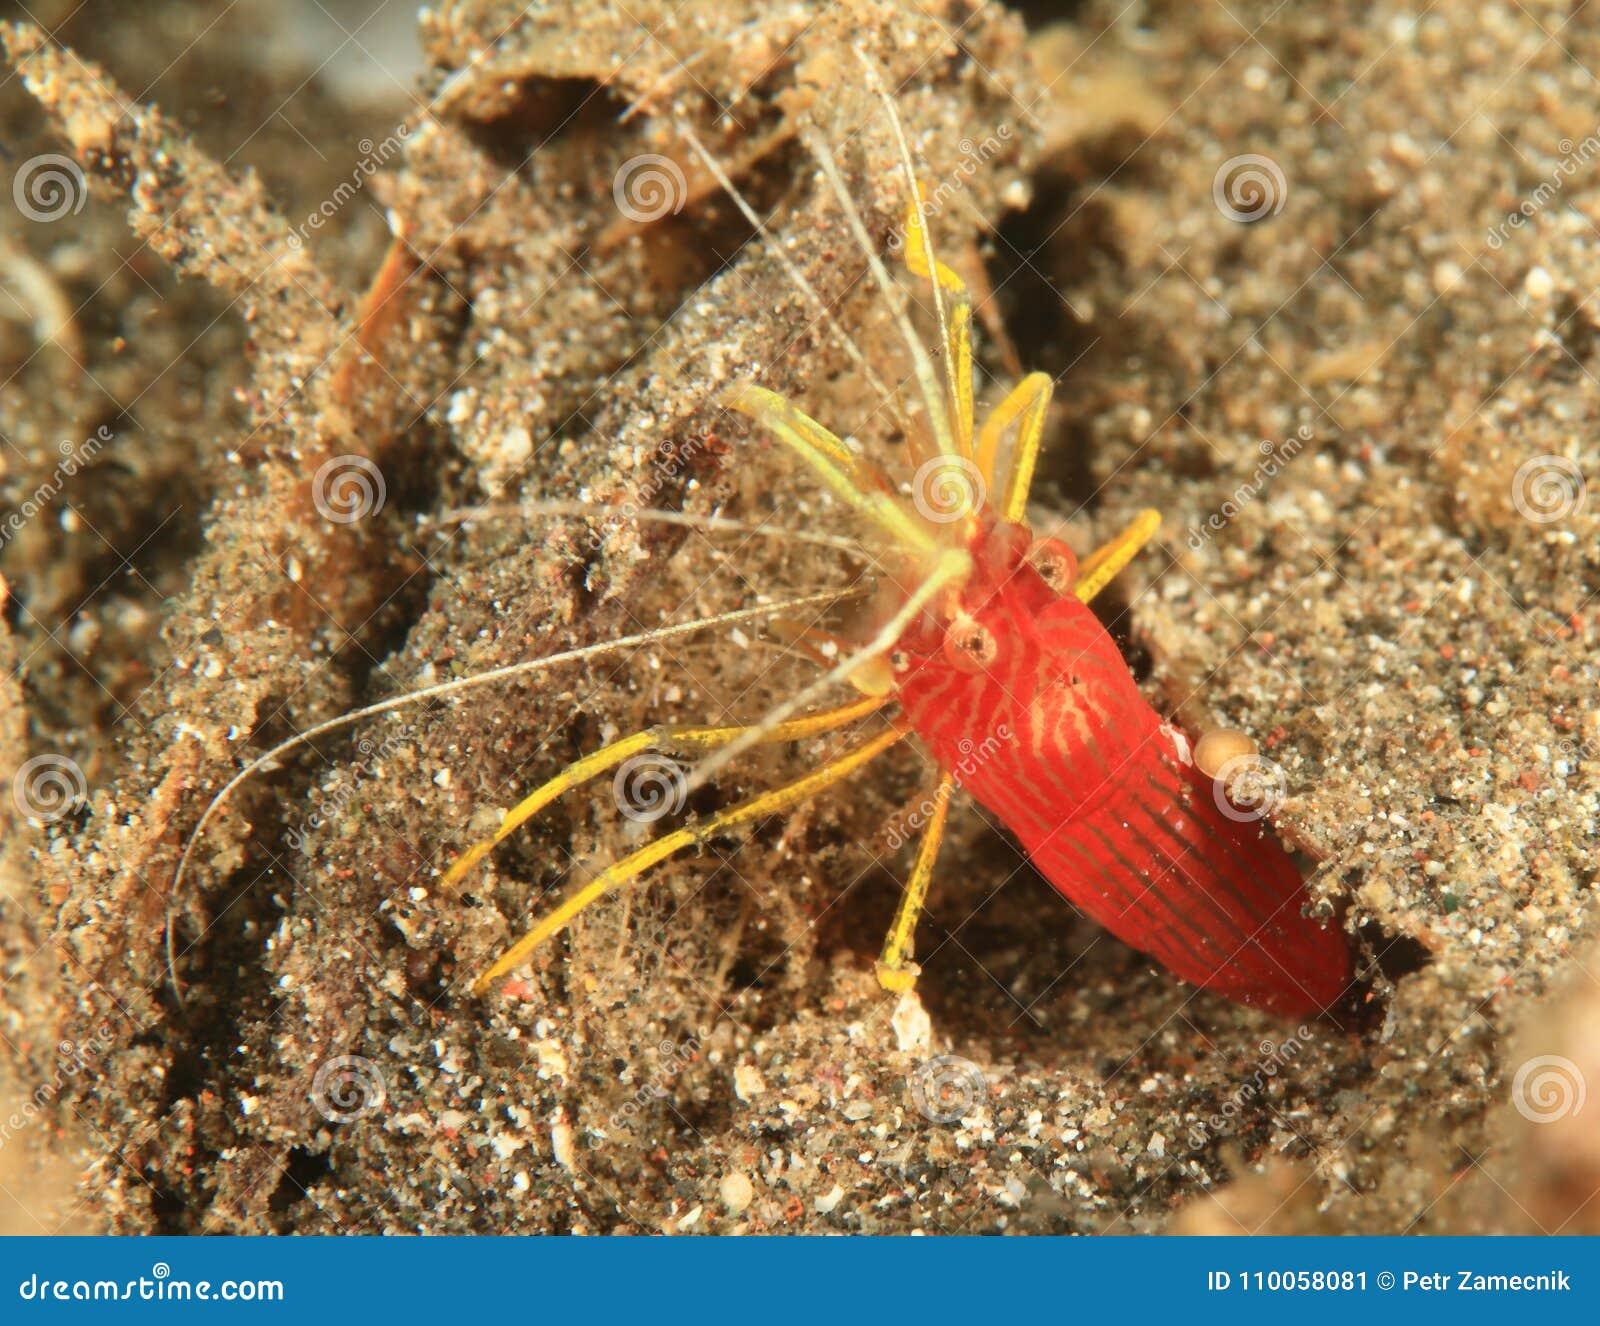 Red-striped Cleaner Shrimp